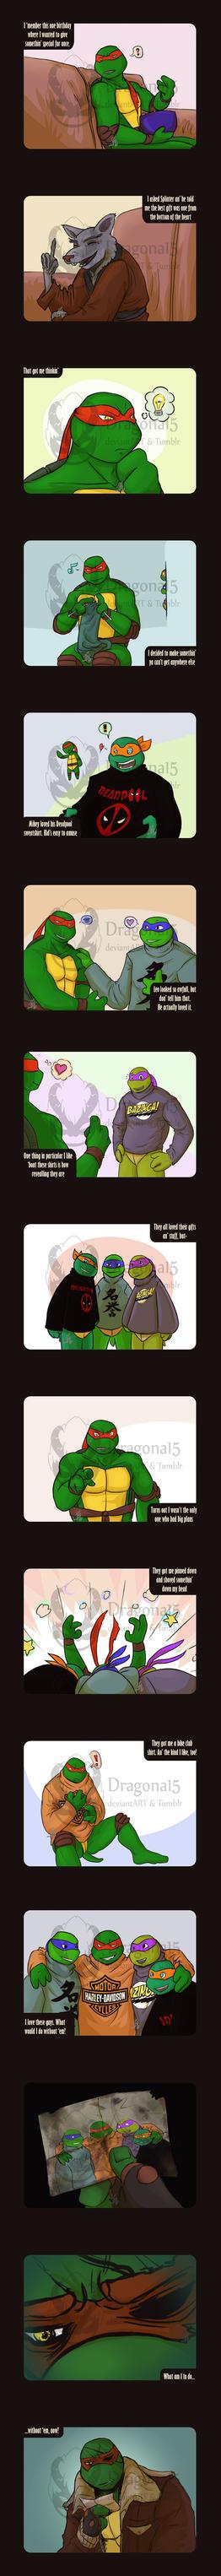 TMNT Raphaels Presents Extension by Dragona15